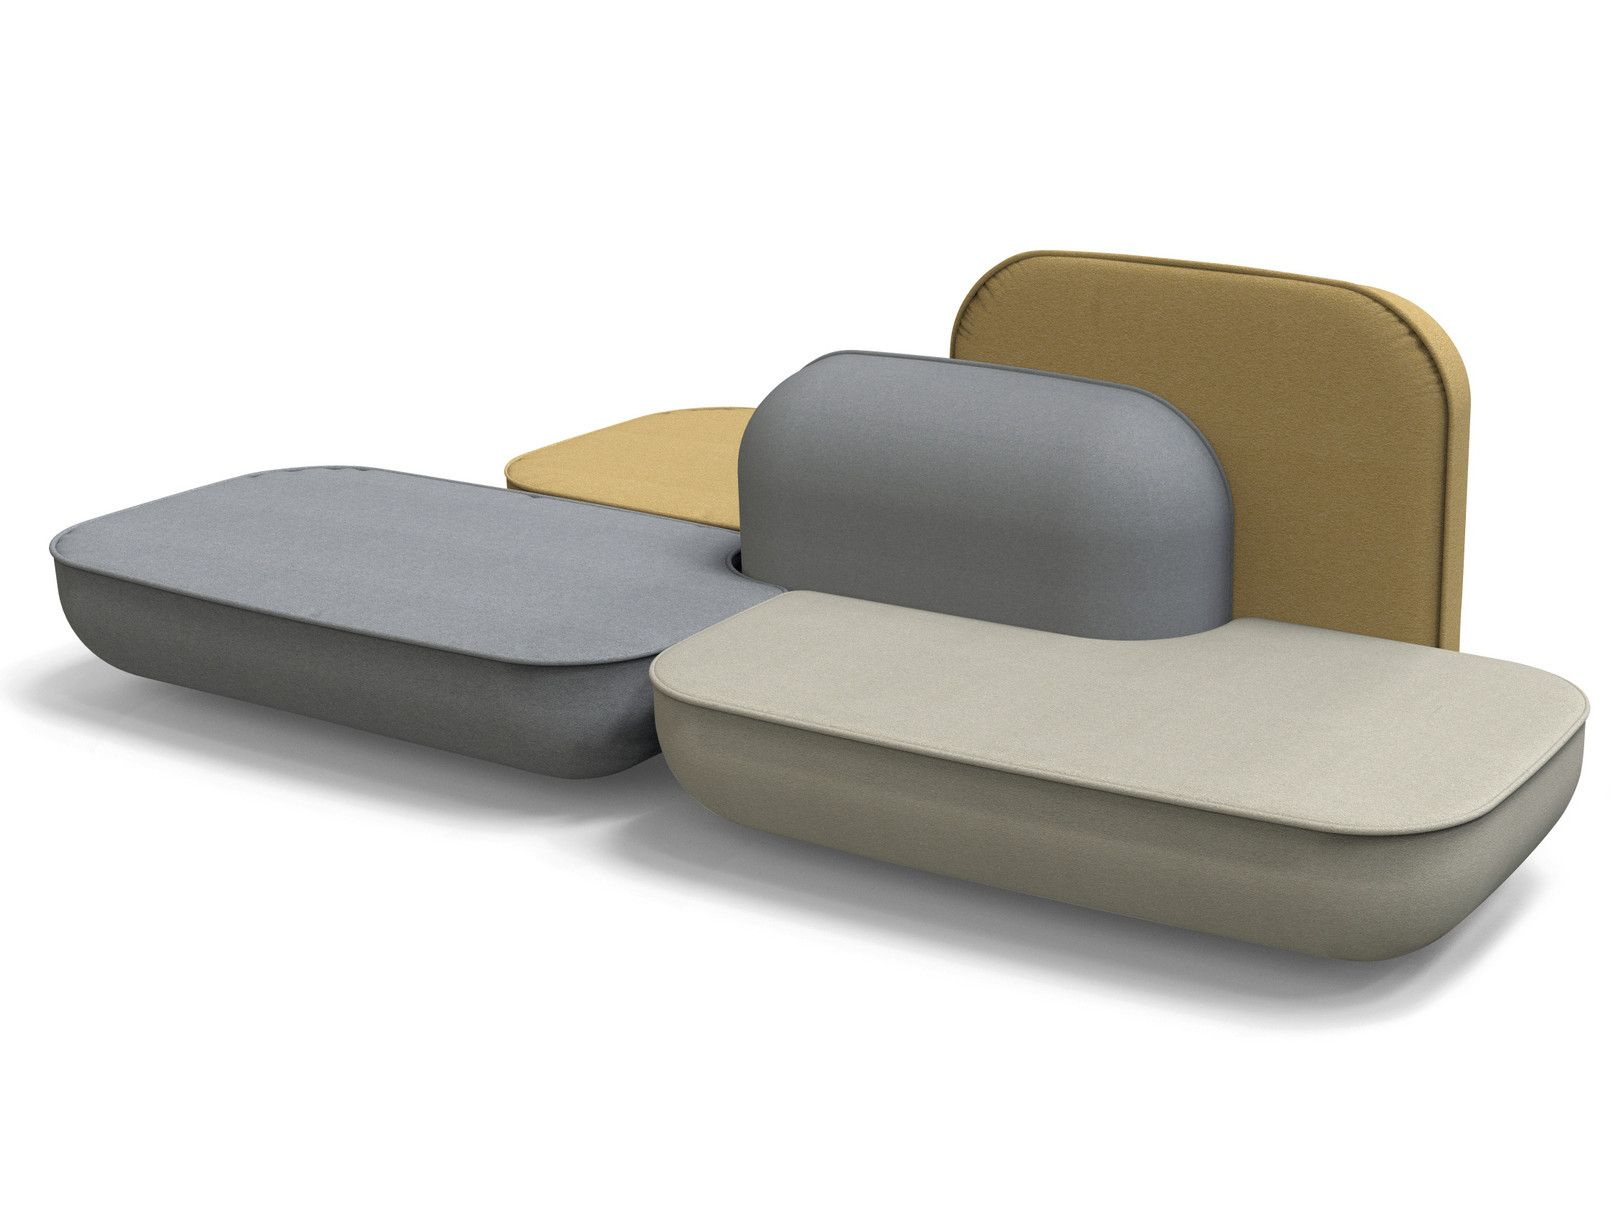 Divano componibile modulare OKOME O07 by Alias | sofa | Pinterest ...